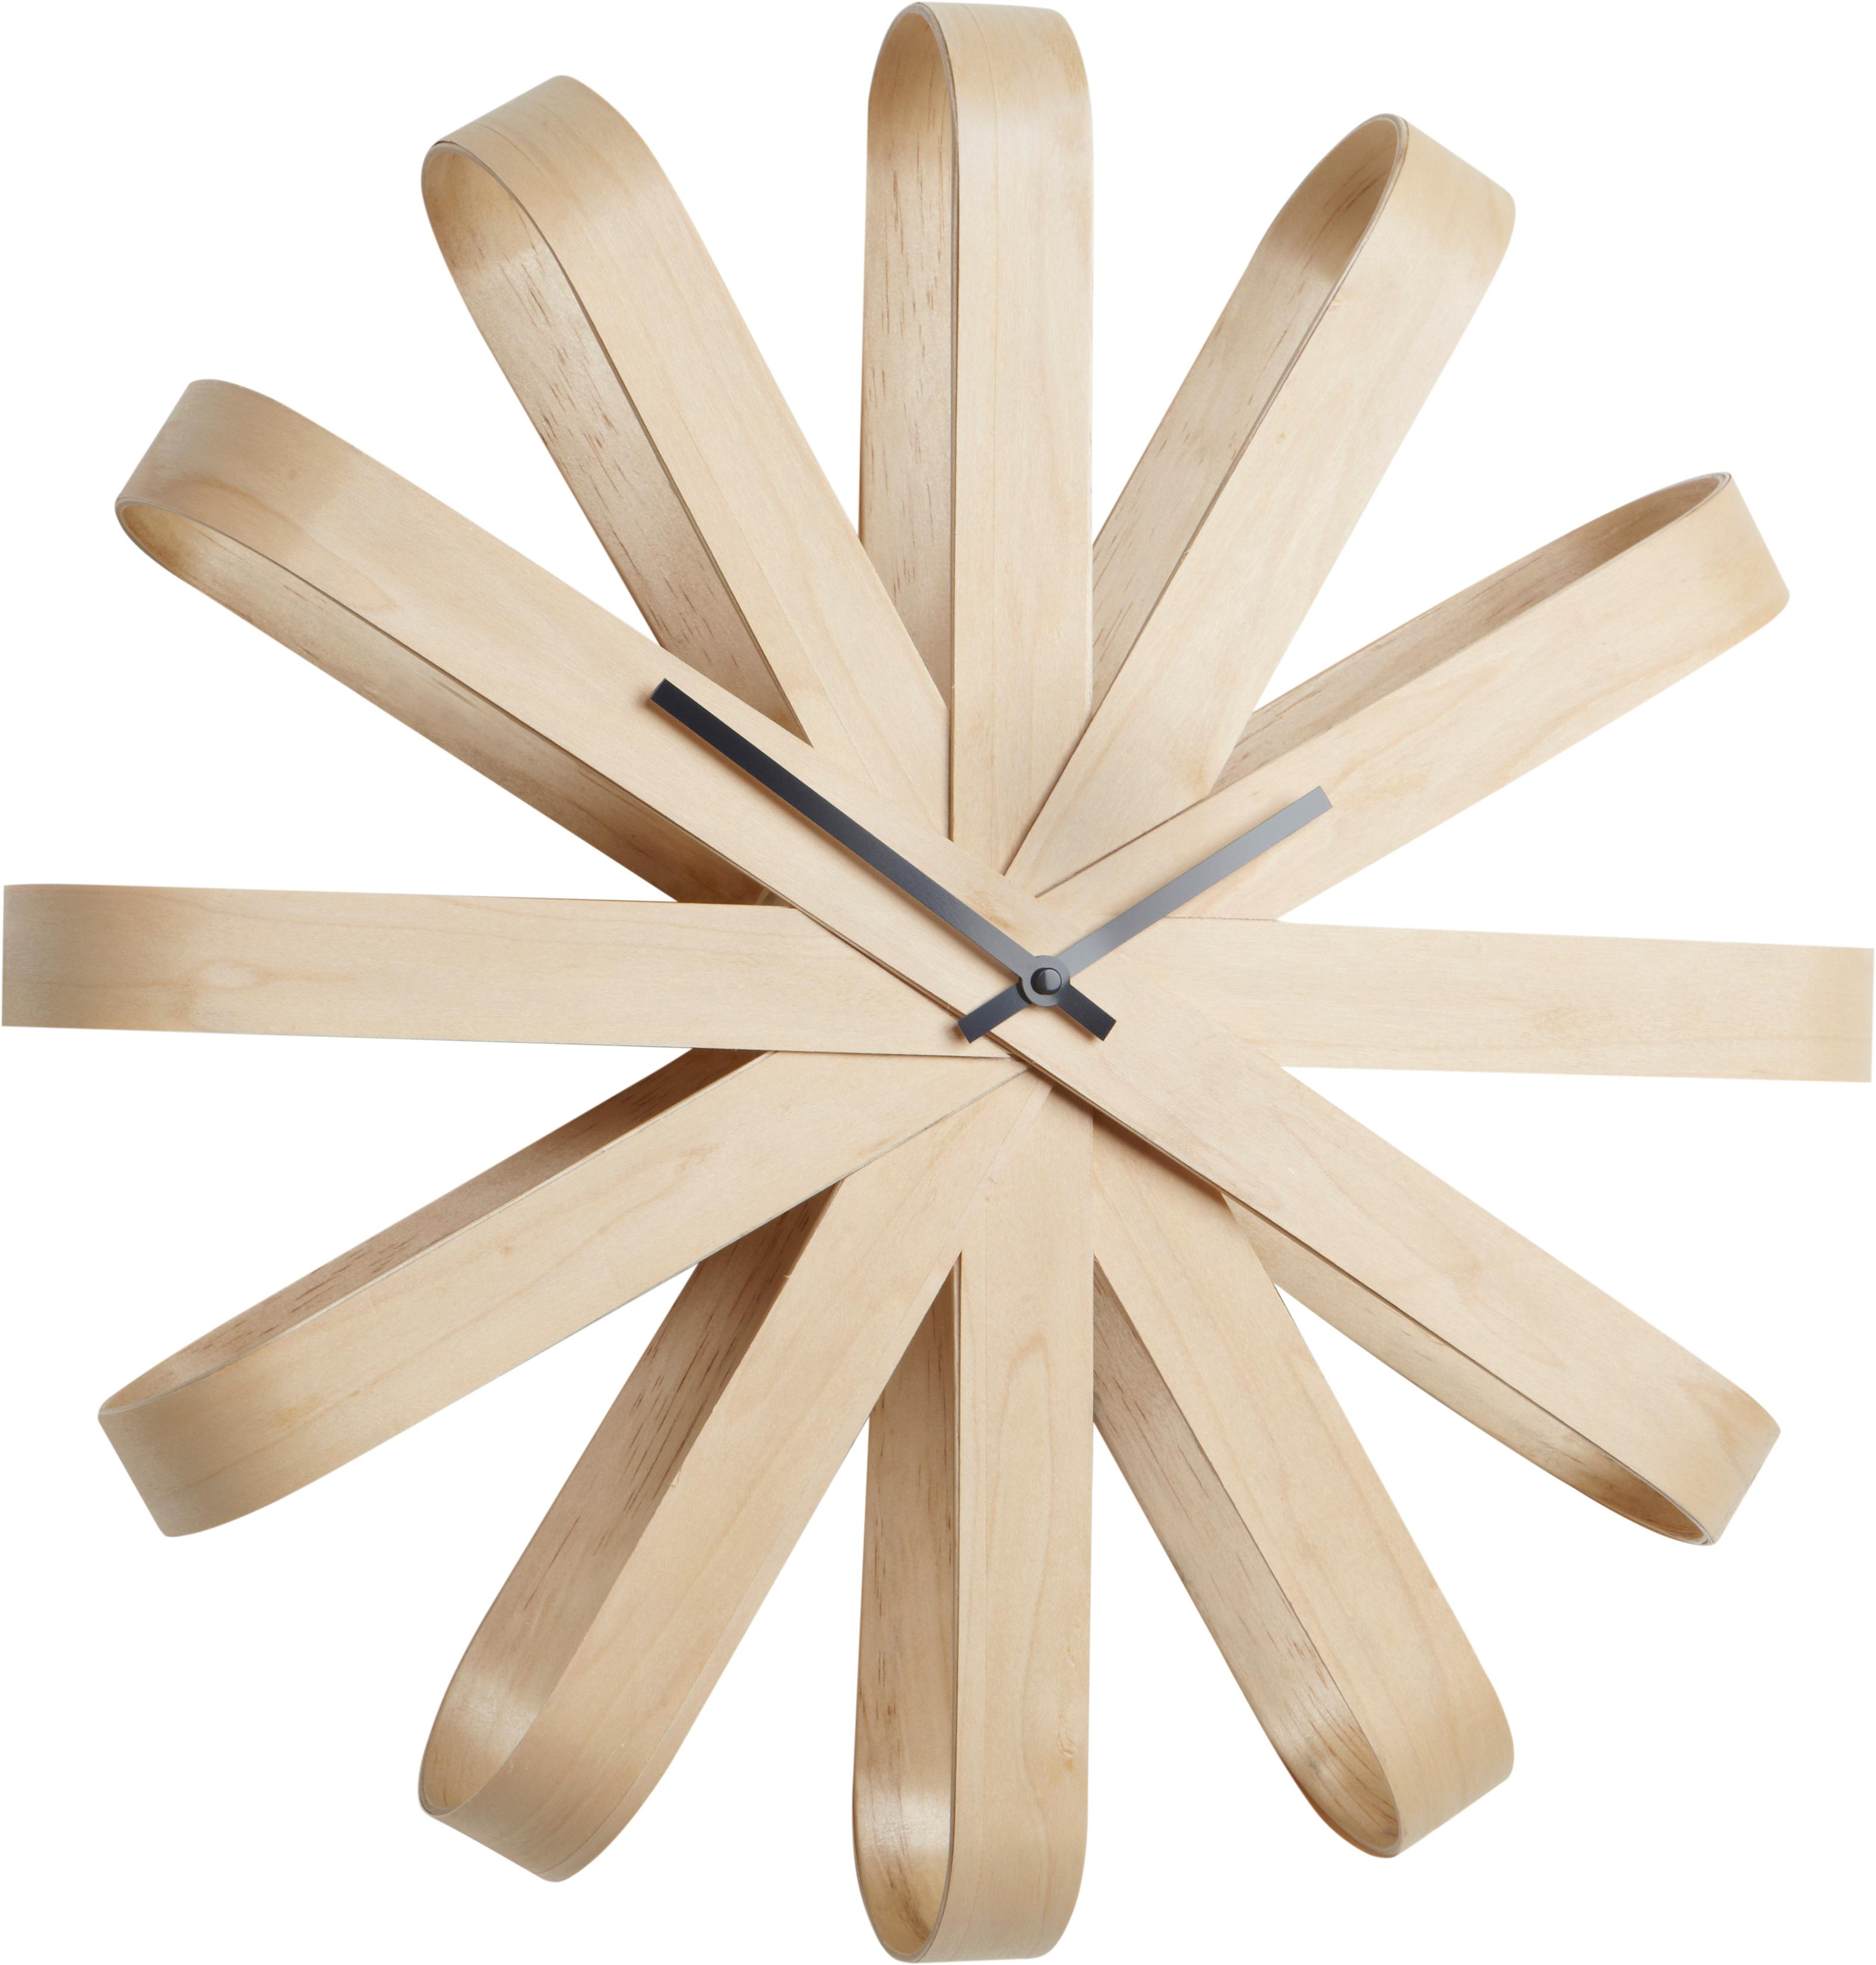 Wandklok Ribbon, Beukenhout, antraciet, Ø 51 cm